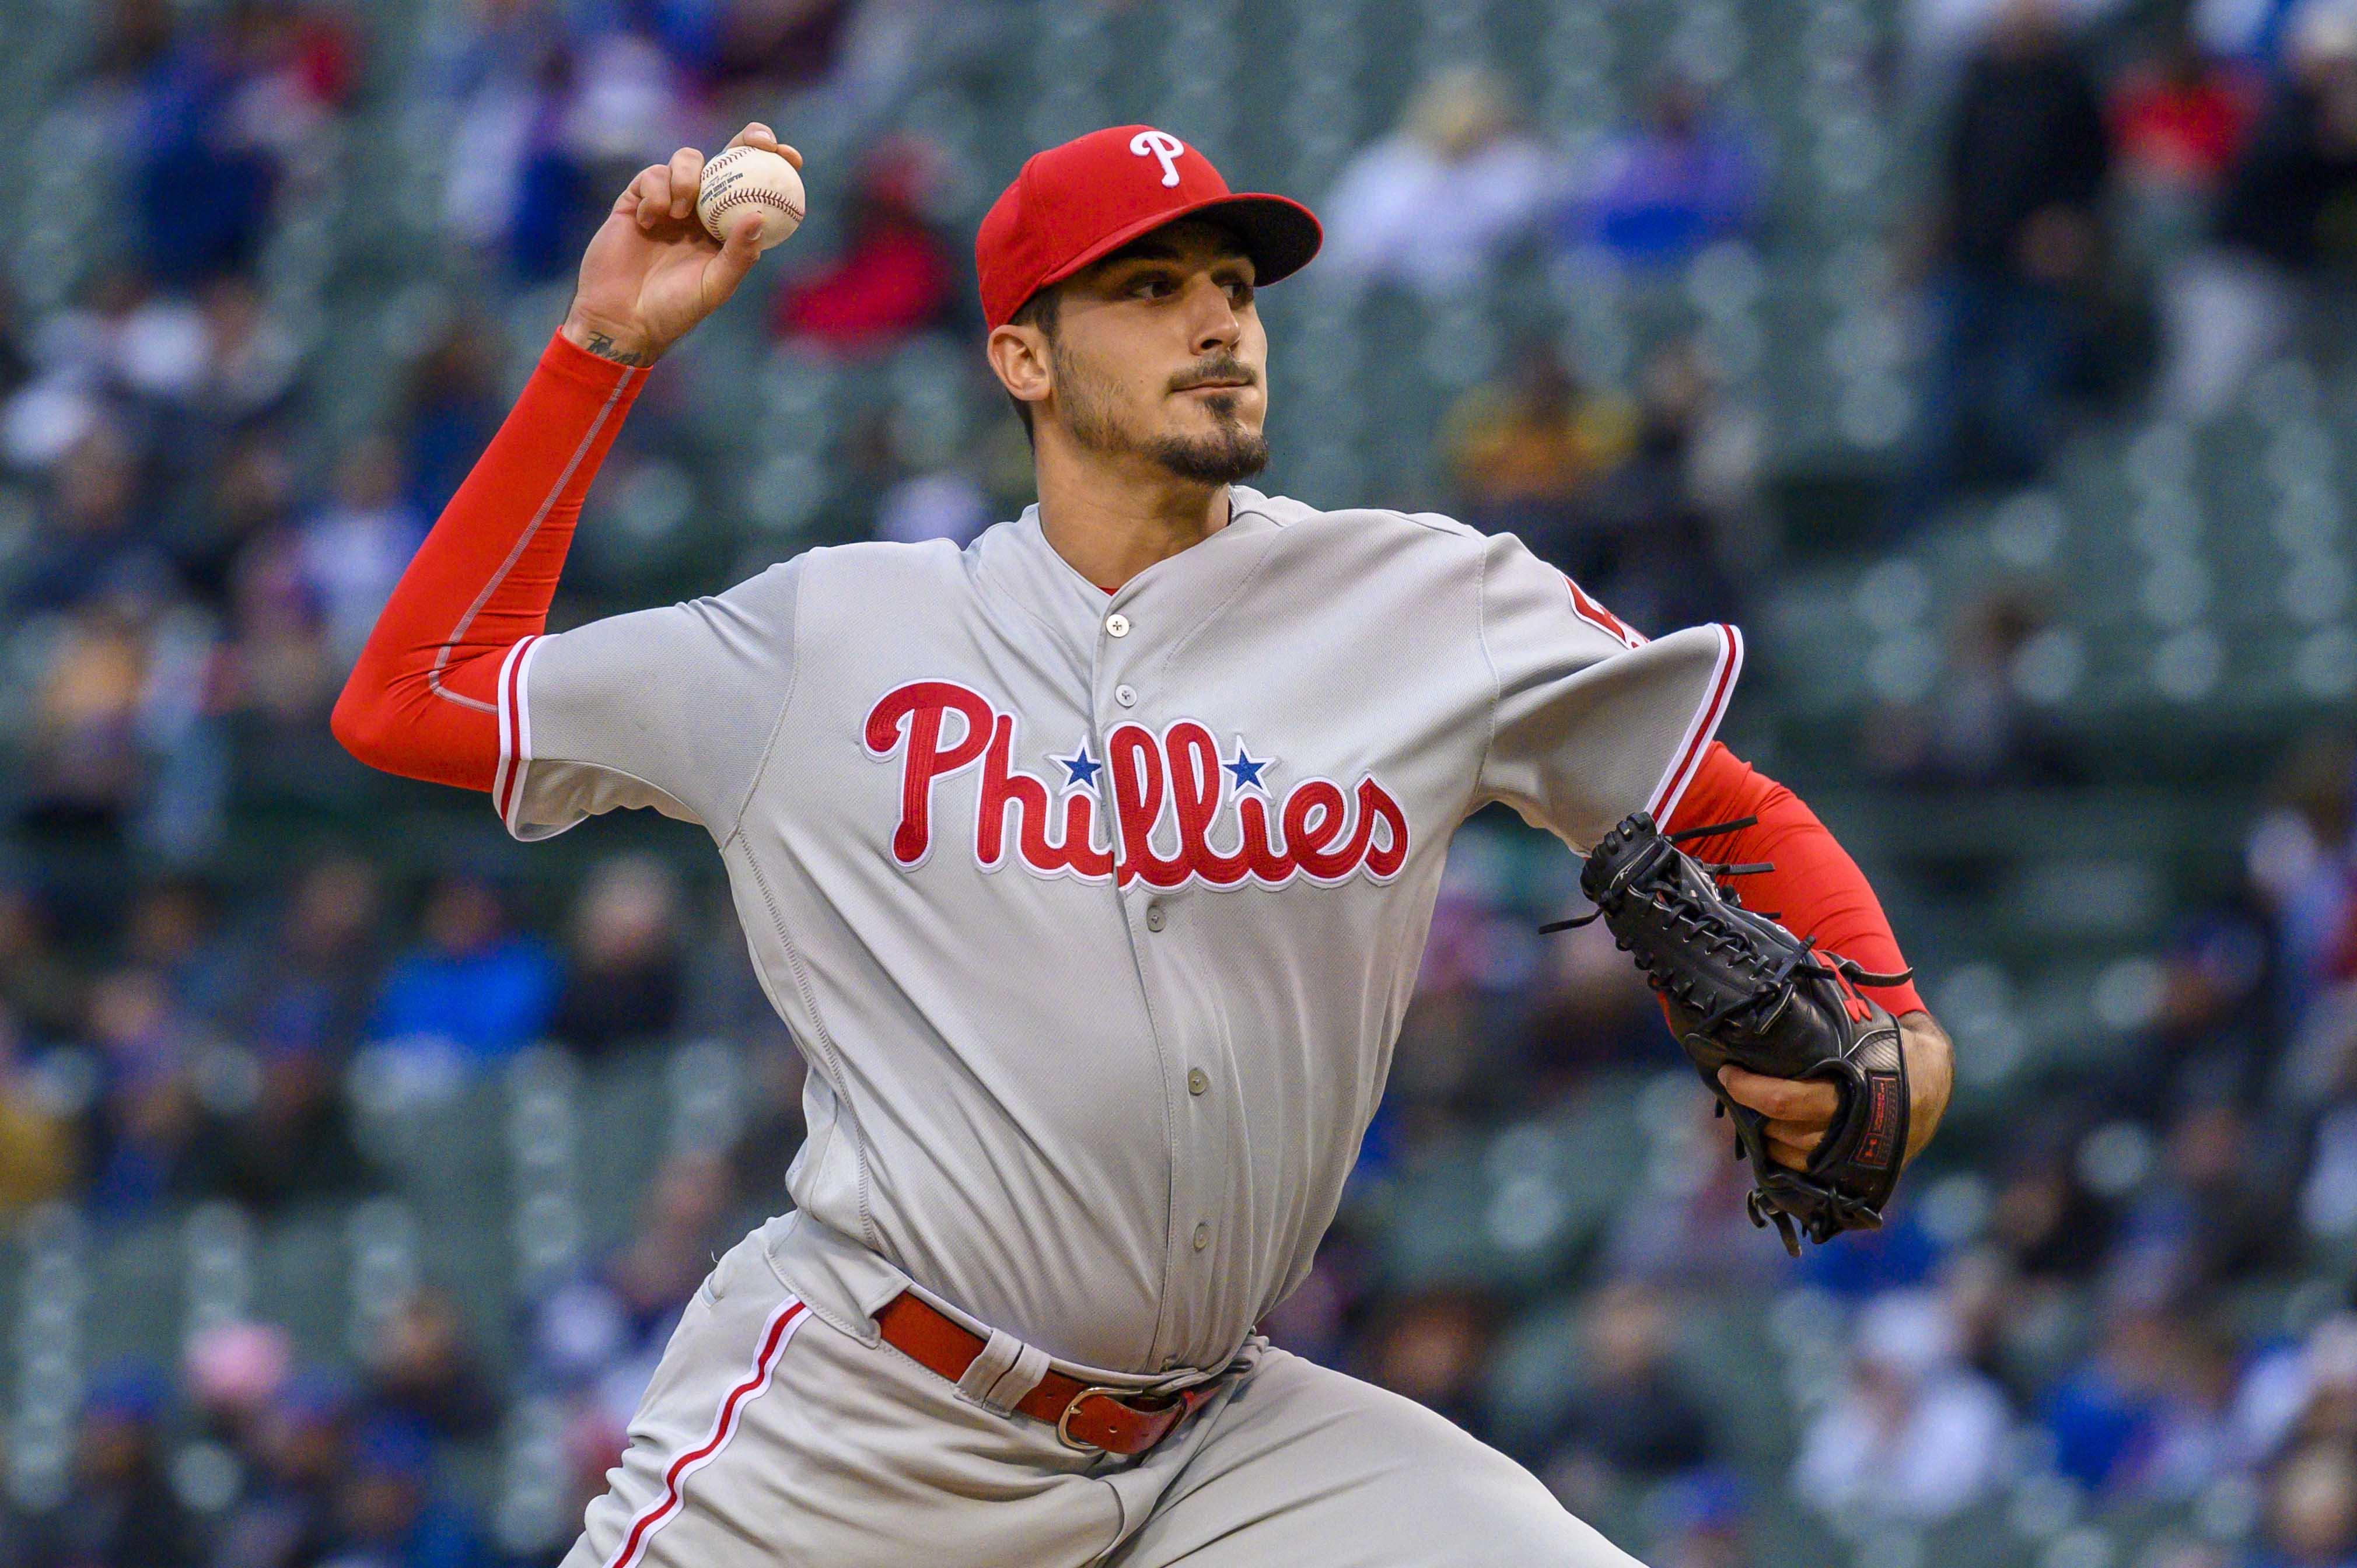 MLB: Philadelphia Phillies at Chicago Cubs